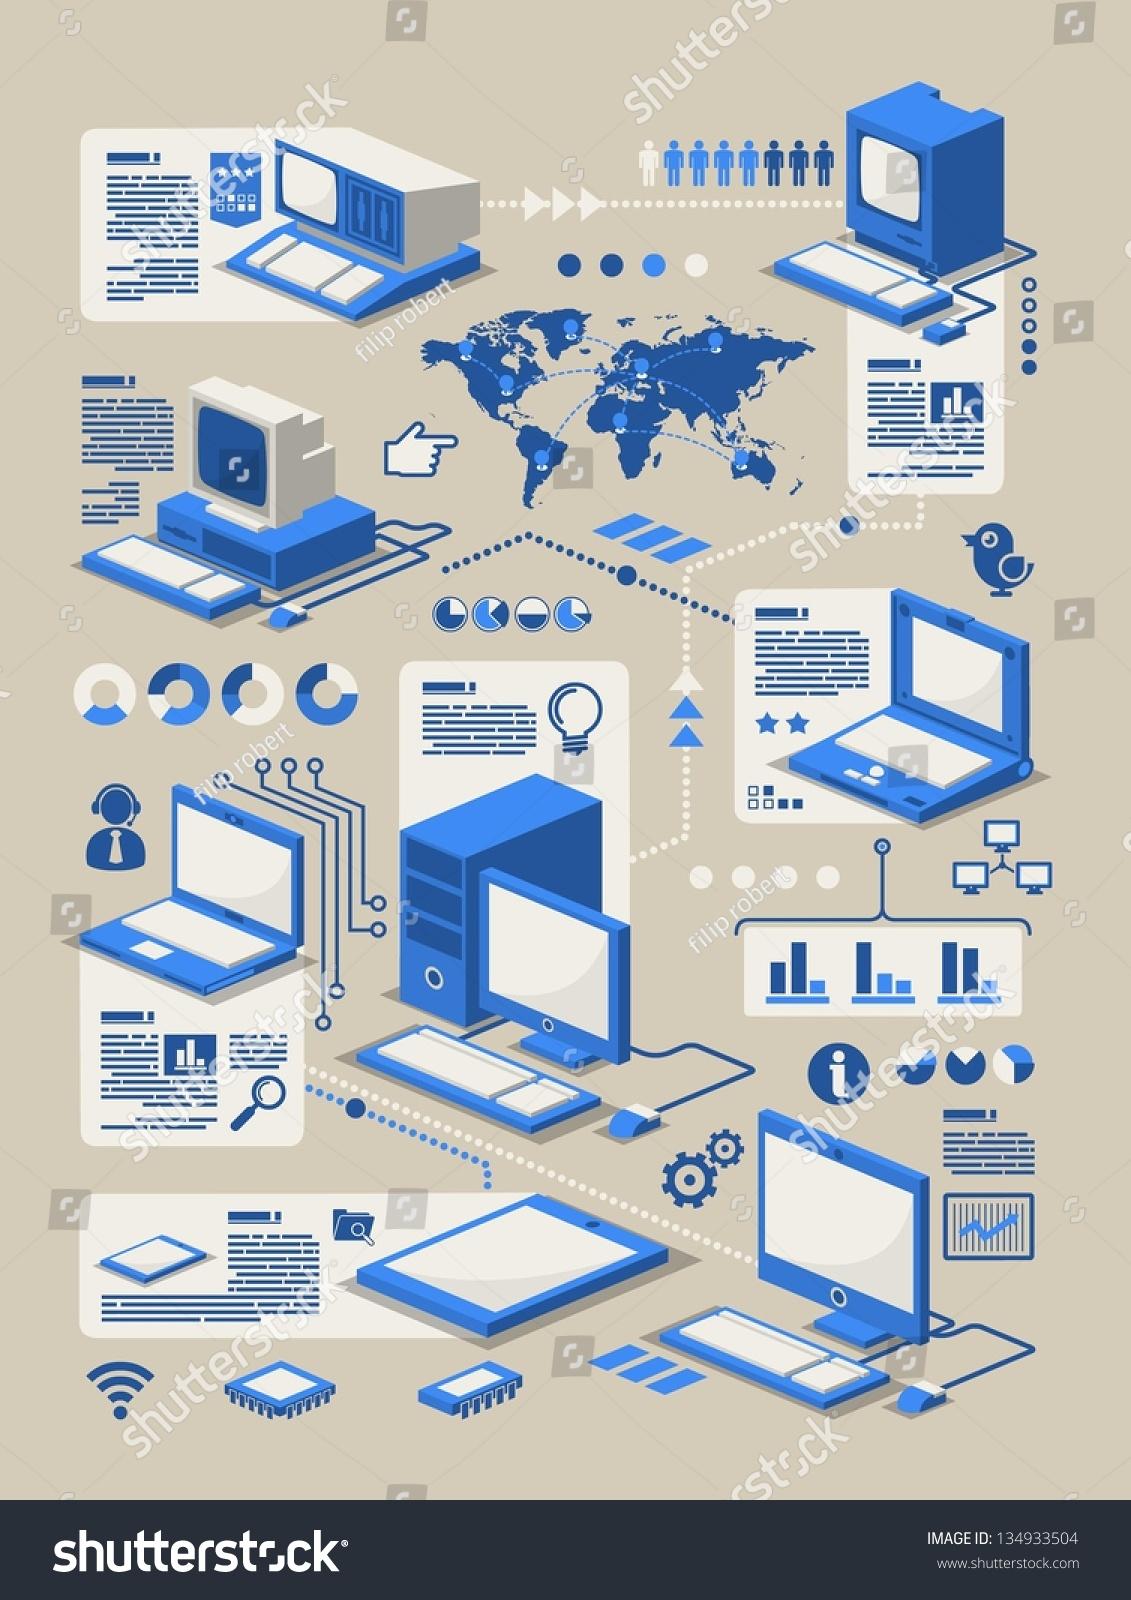 Computer Evolution Info Graphicvector Background Stock Vector ...